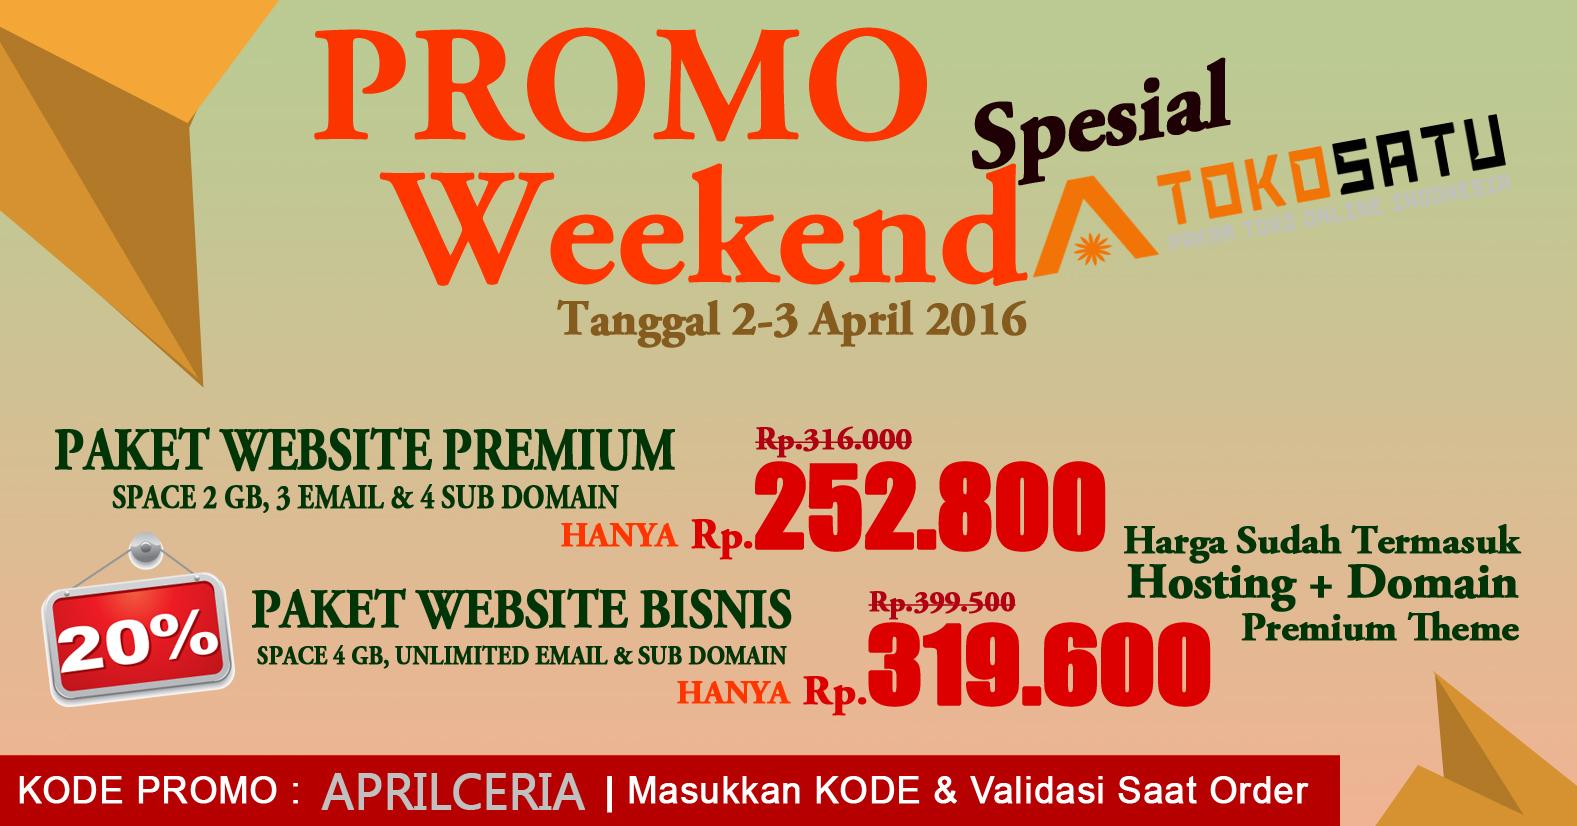 Promo Spesial Weekend APRILCERIA TokoSatu 2-3 April 2016